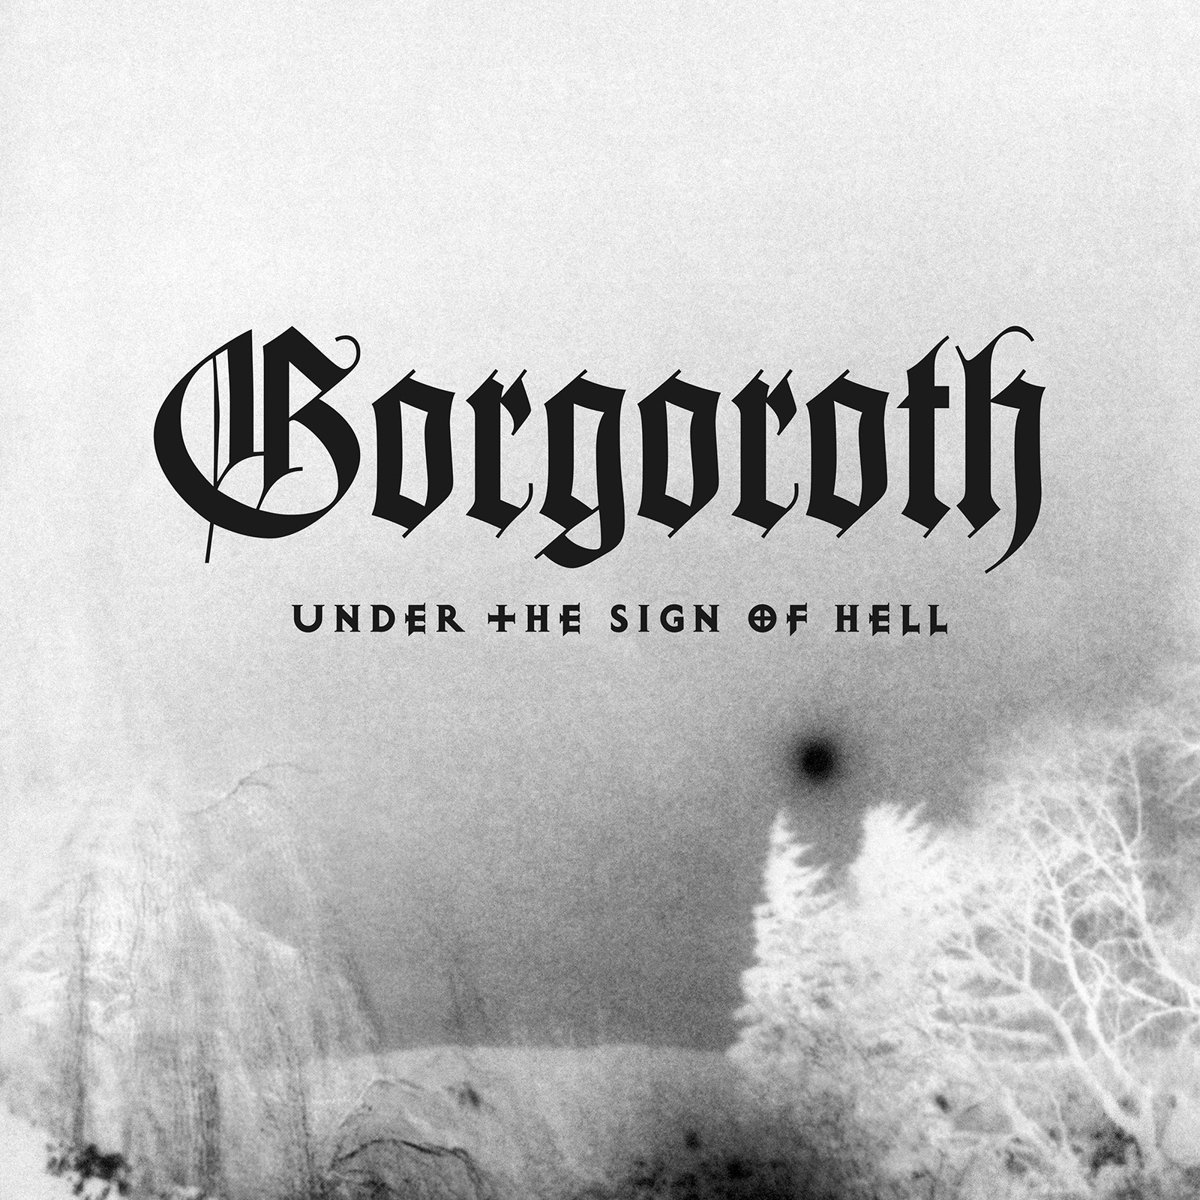 Vinilo : Gorgoroth - Under The Sign Of Hell (LP Vinyl)